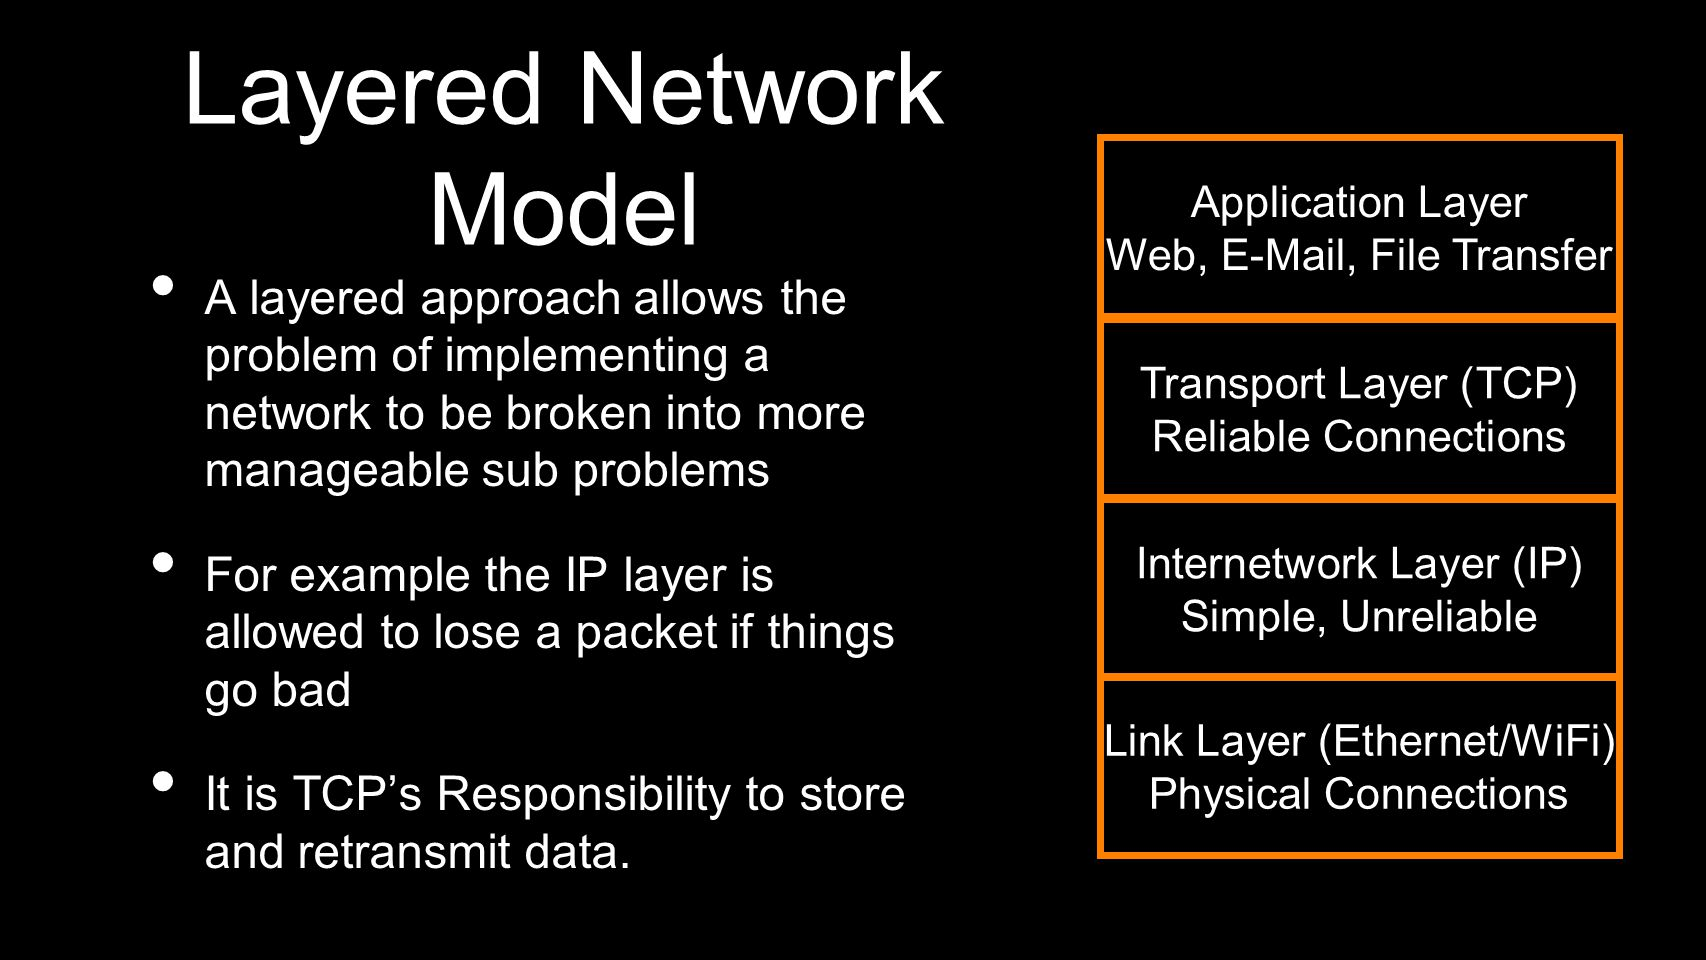 Layered Network Model Application Layer. Web, E-Mail, File Transfer.